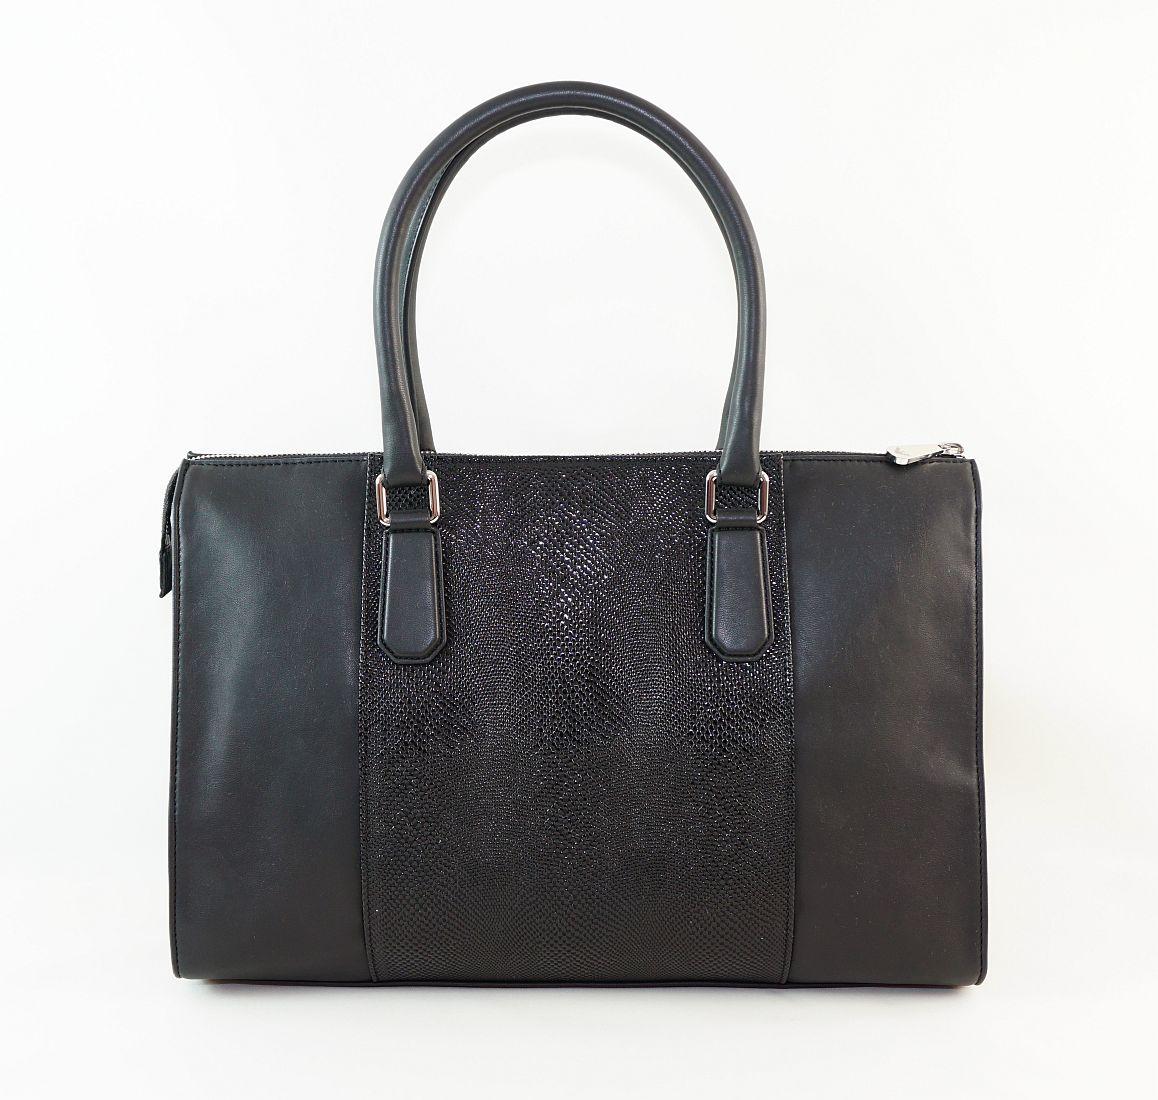 Armani Jeans Handtasche Shopper Tasche 922060 6A725 00020 Nero HW16-1